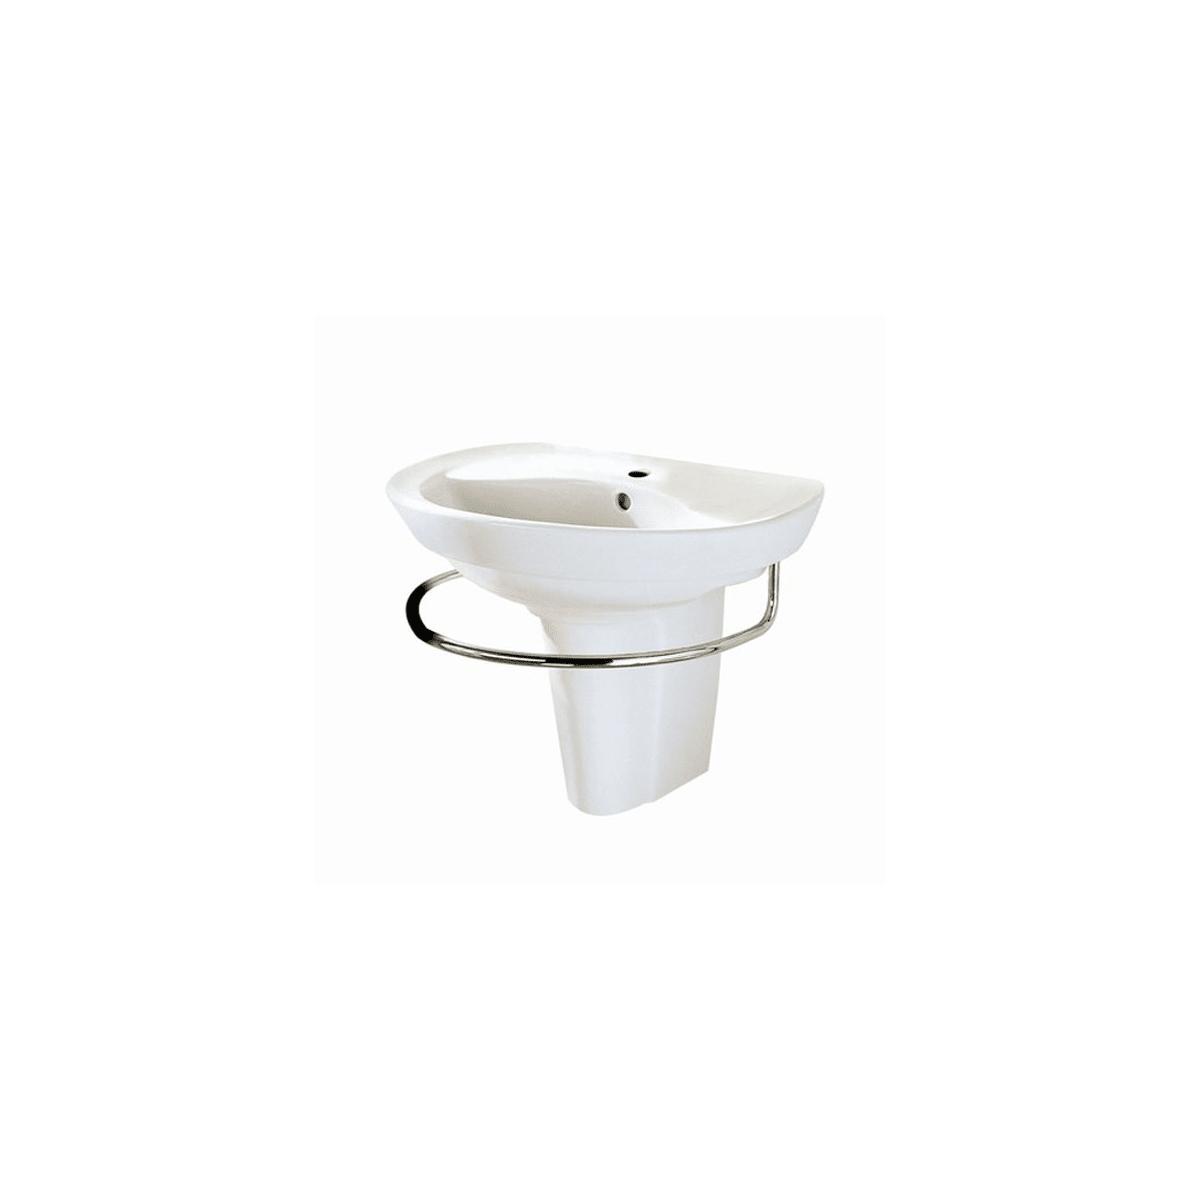 American Standard Lavatory Sink   www.topsimages.com